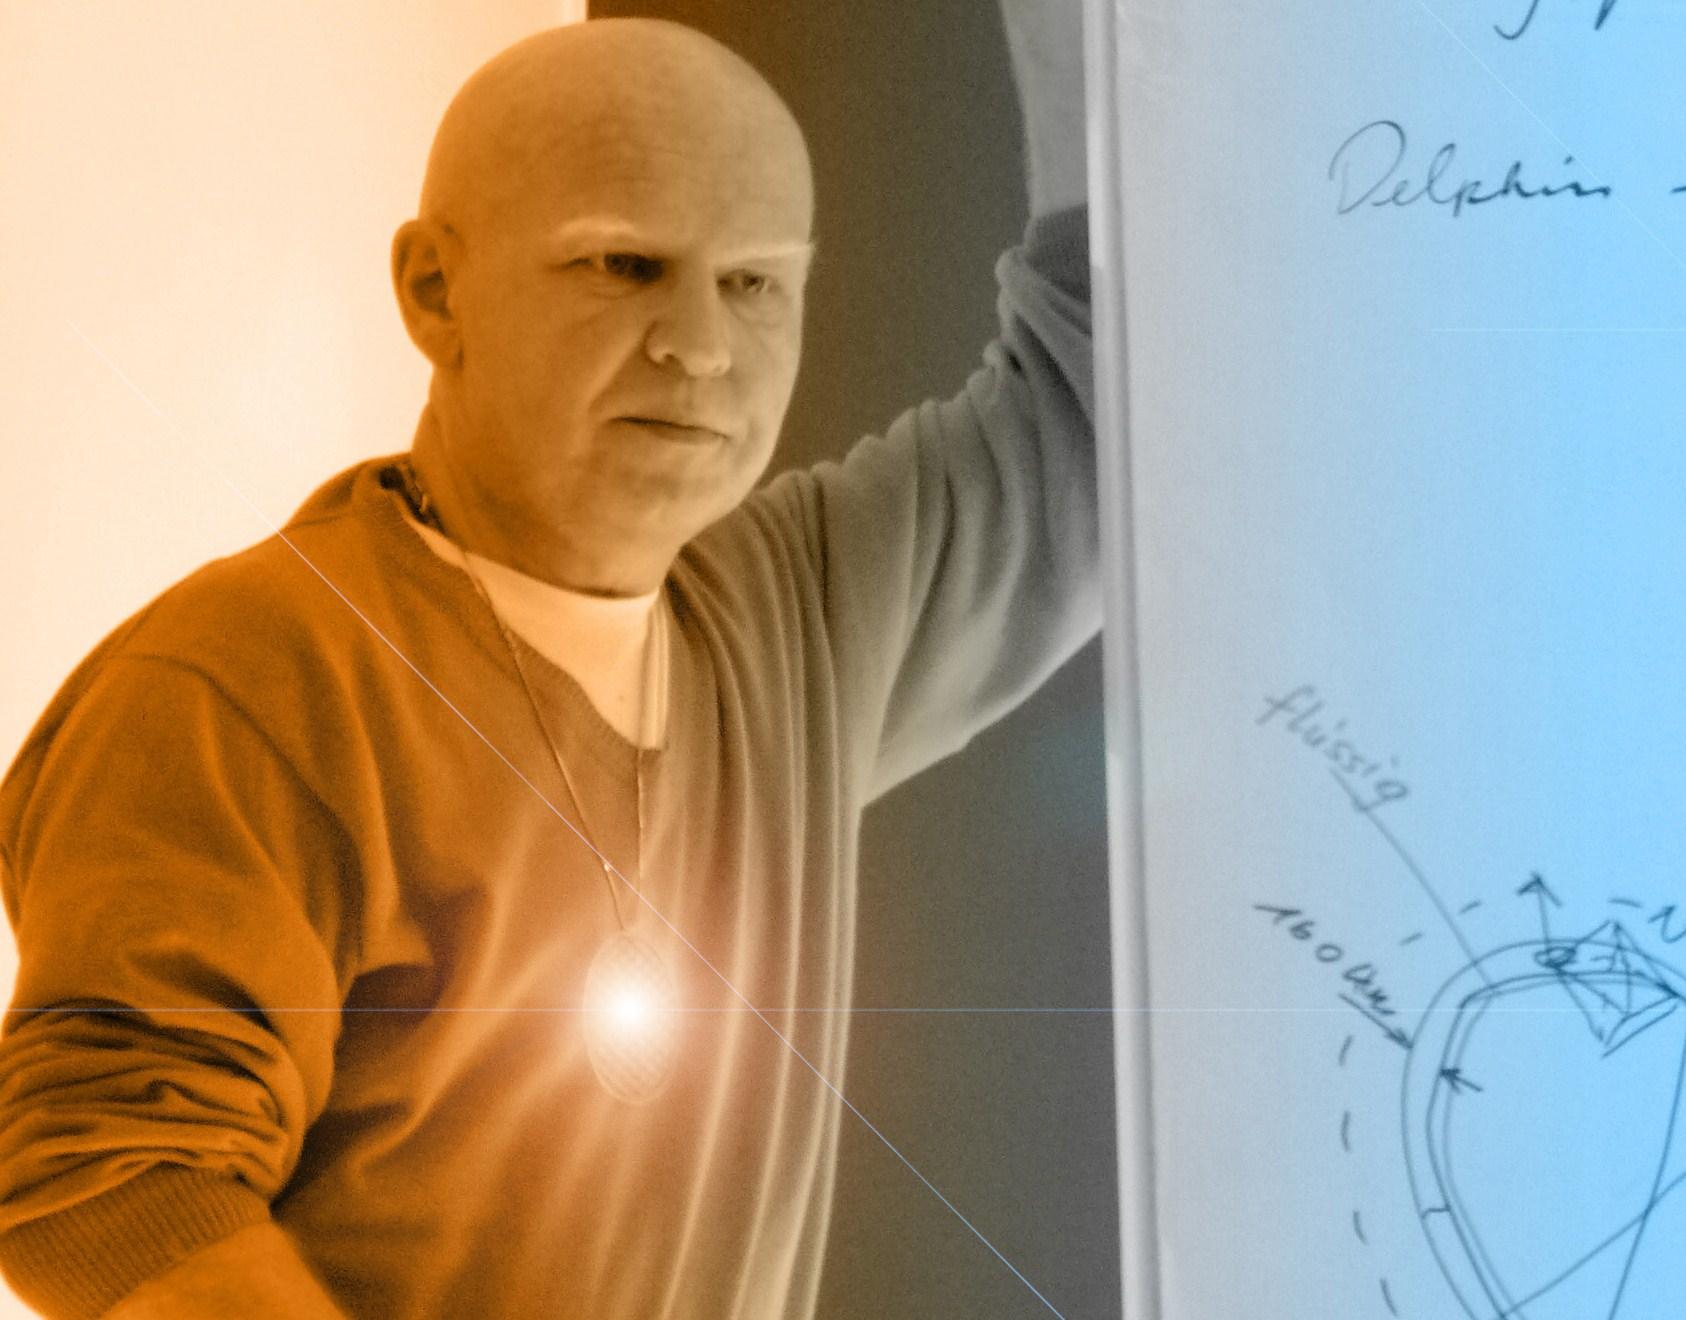 Johannes teaching